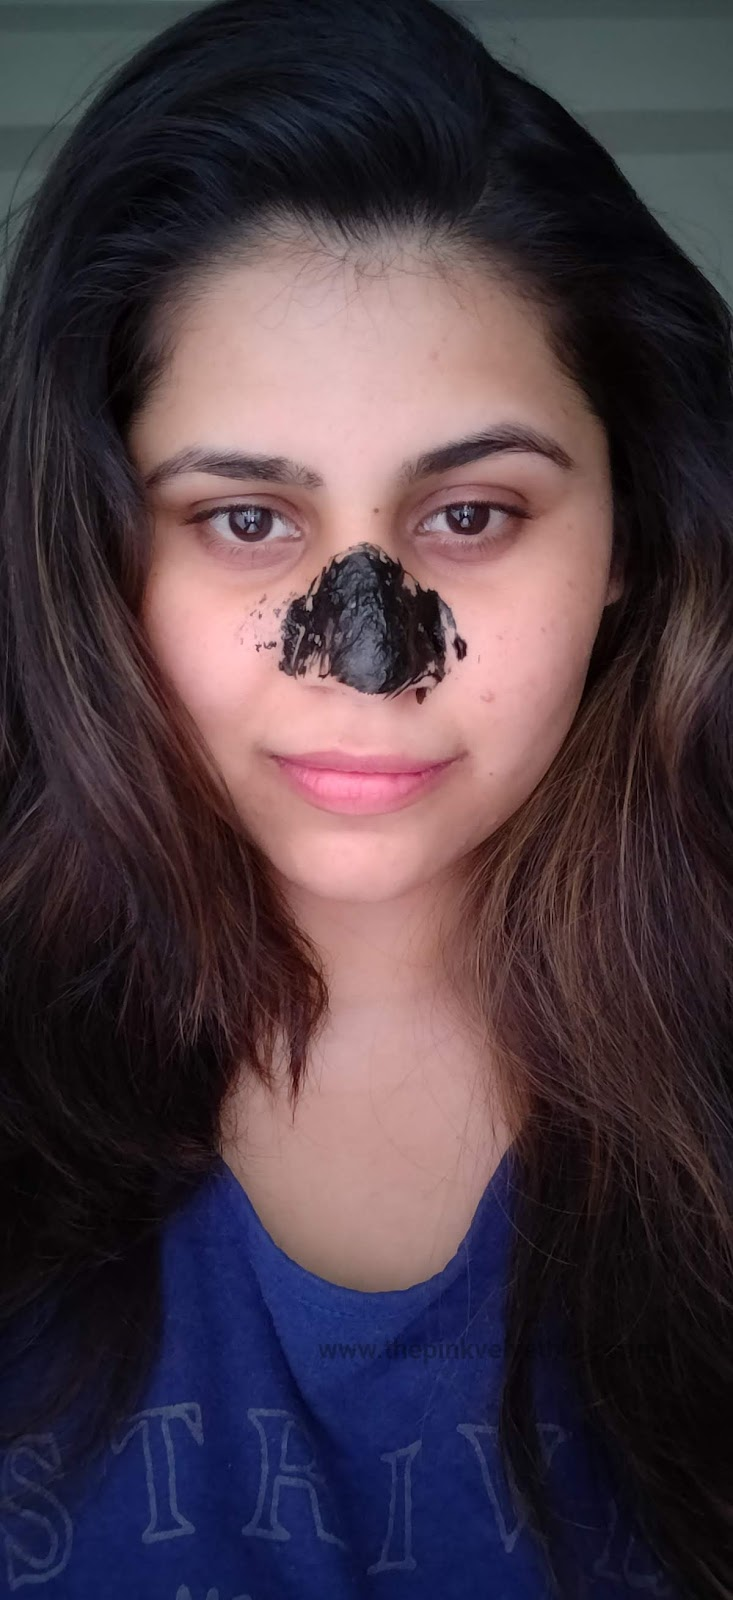 Niharika Verma - Beard Hood Charcoal Blackhead Peel-off Mask - Review